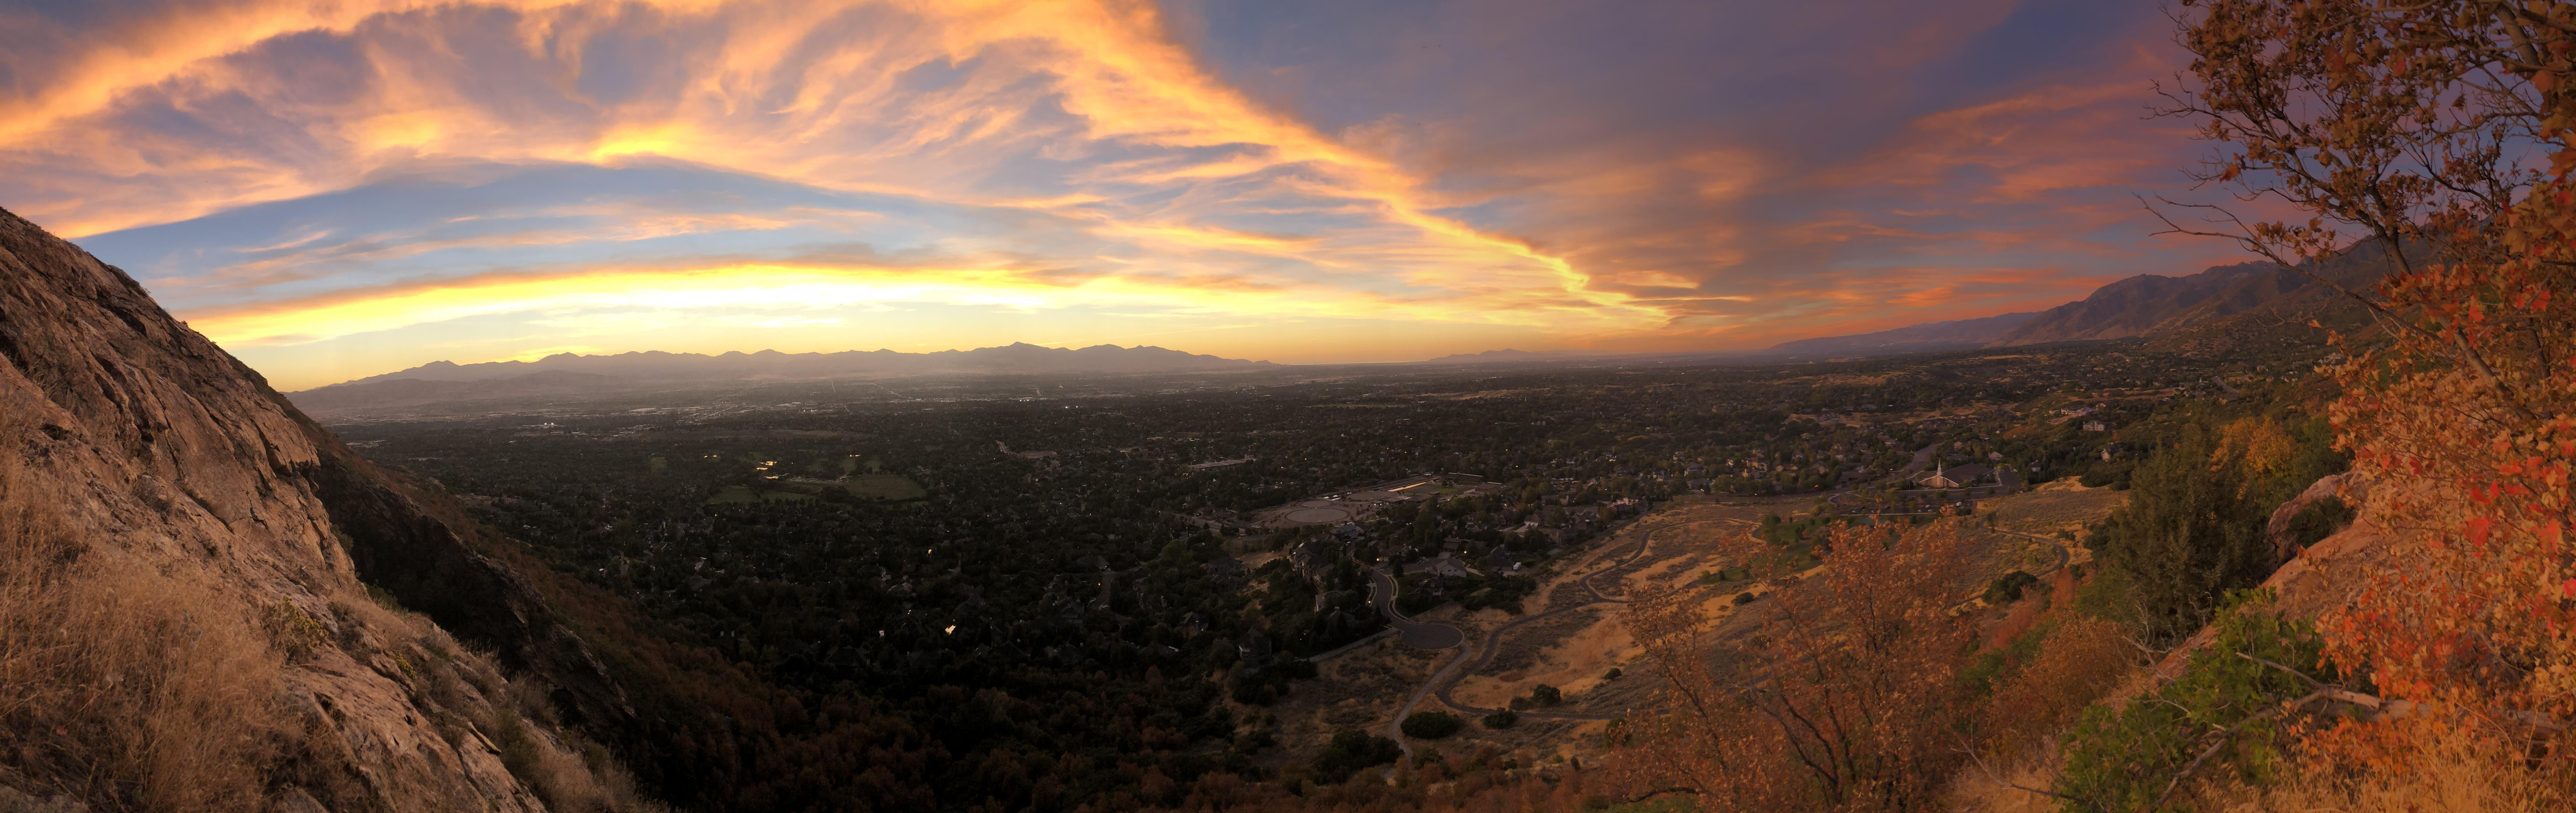 Panoramic View Of Our Sunset Last Night Salt Lake City Utah Panoramic Panoramic Views Salt Lake City Utah